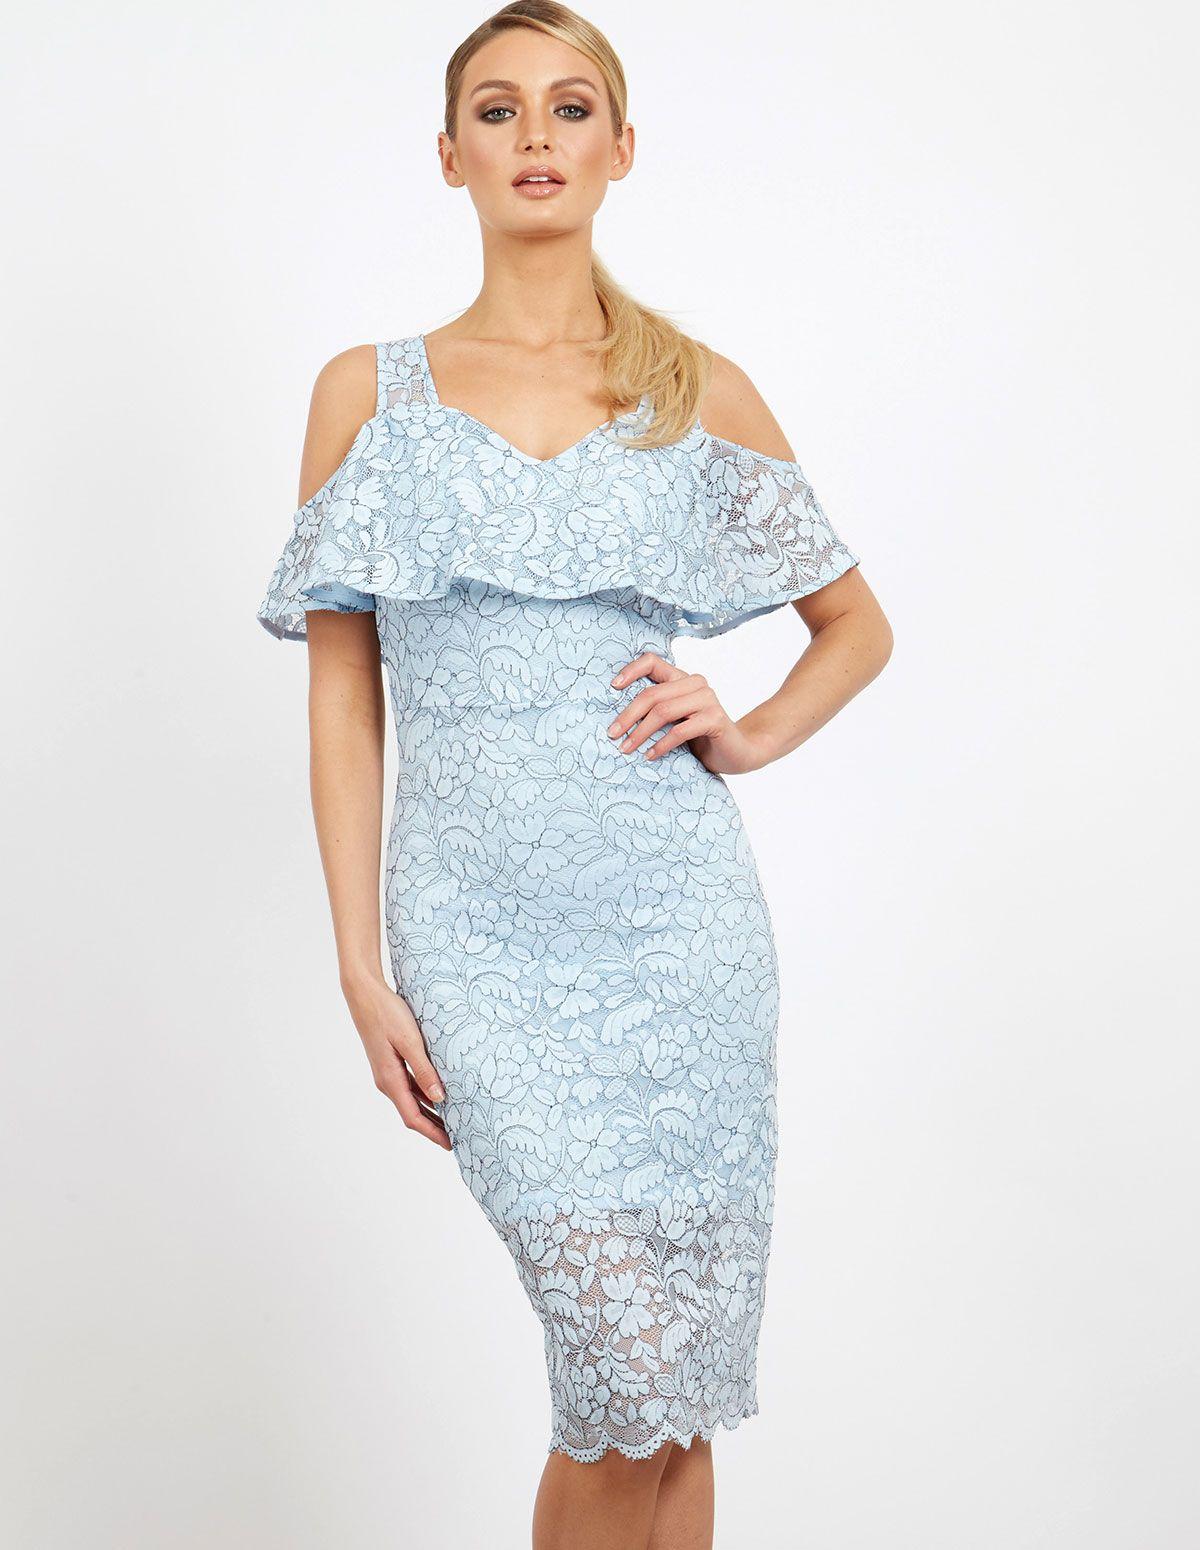 Westley u frill lace cold shoulder dress blue wedding reception